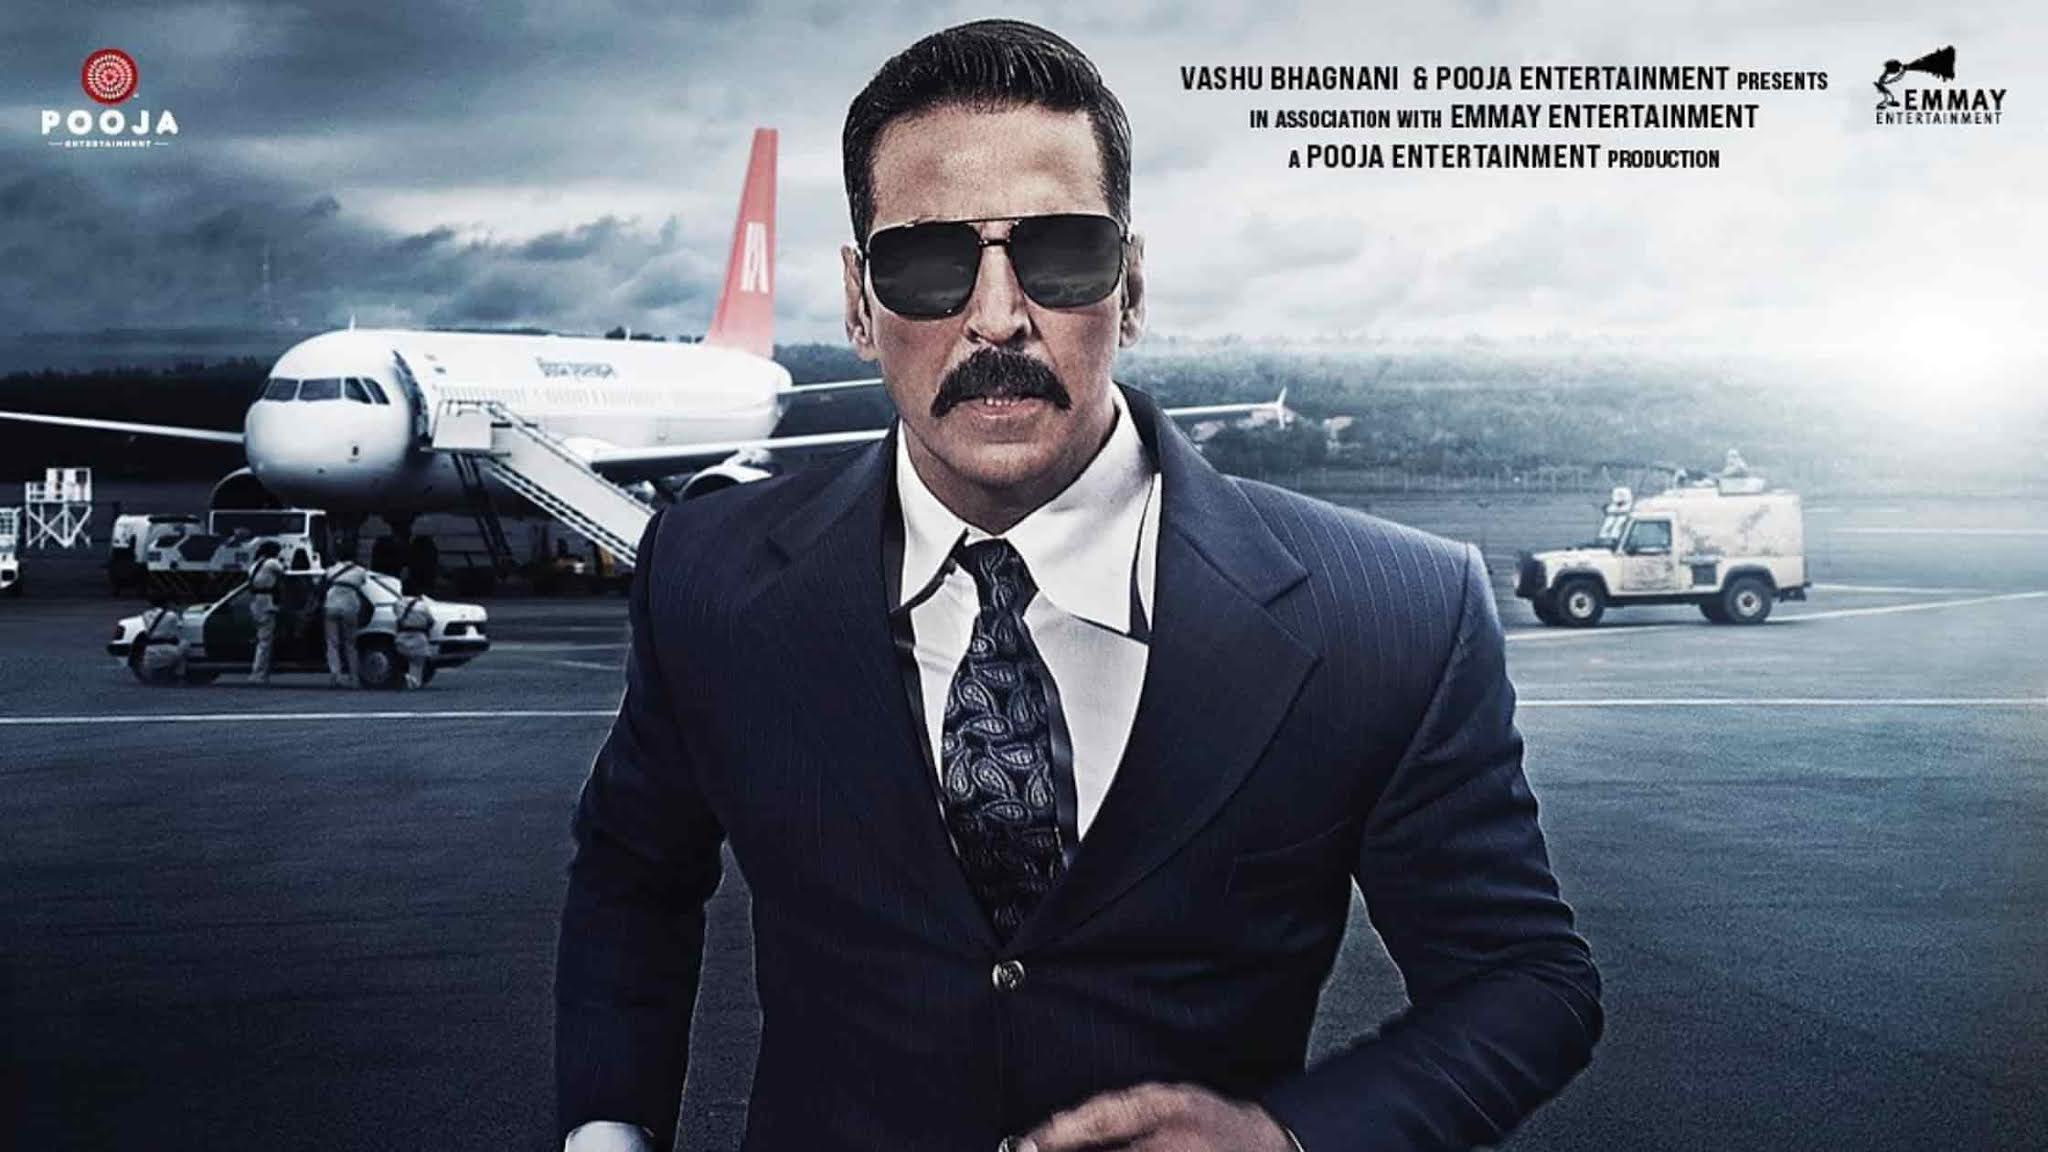 Bell Bottom Teaser: Movie apko 80s ke daur mein le jayegi - Akshay Kumar